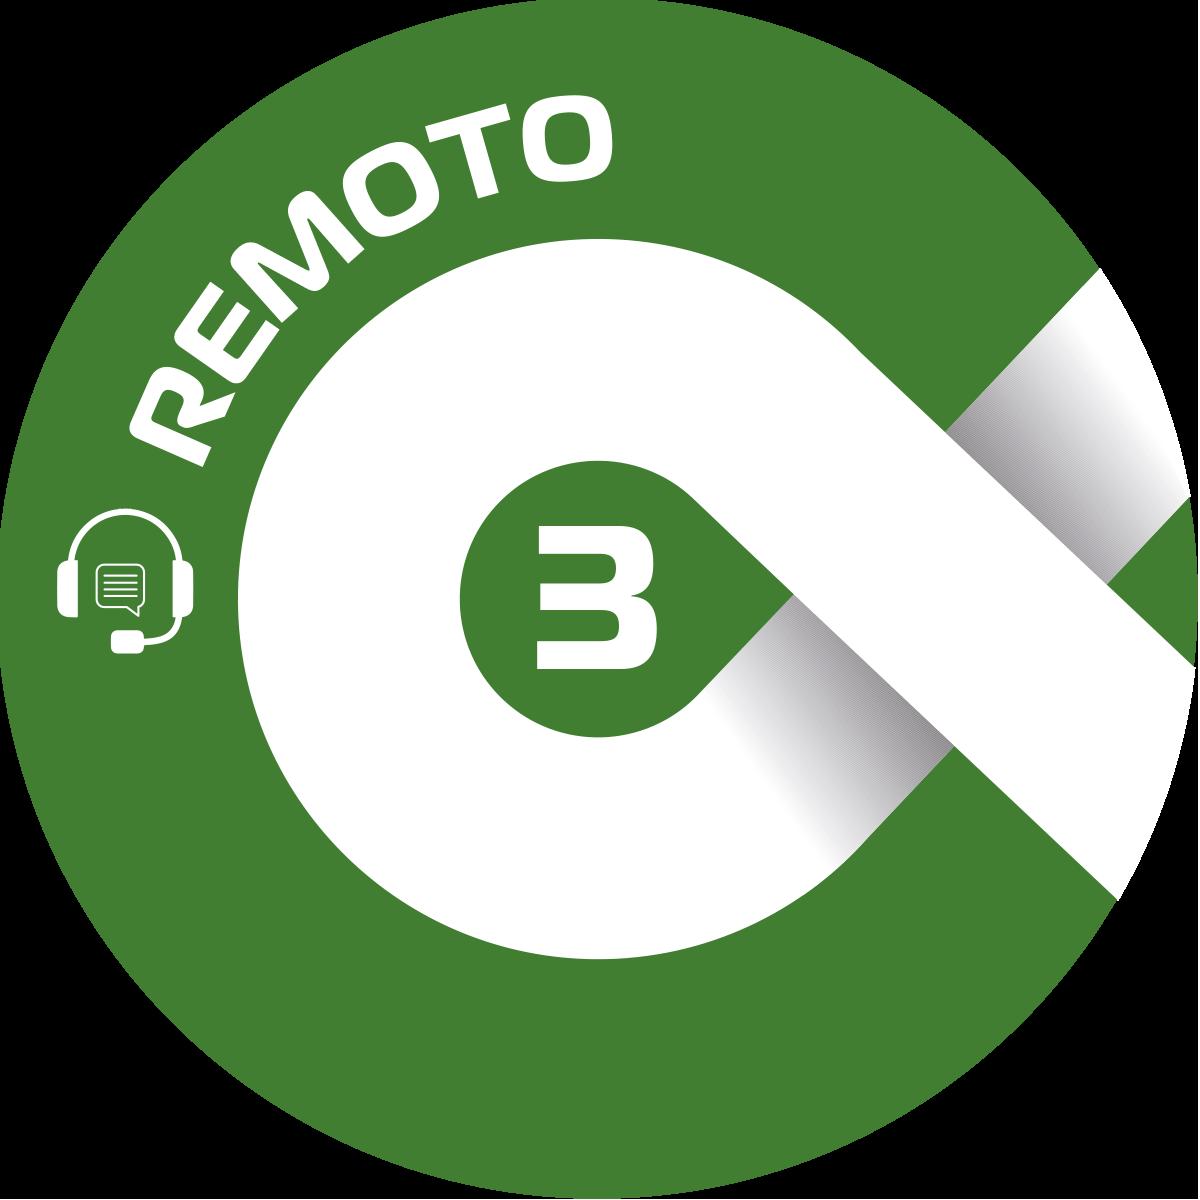 Alfaservice-assistenza remota